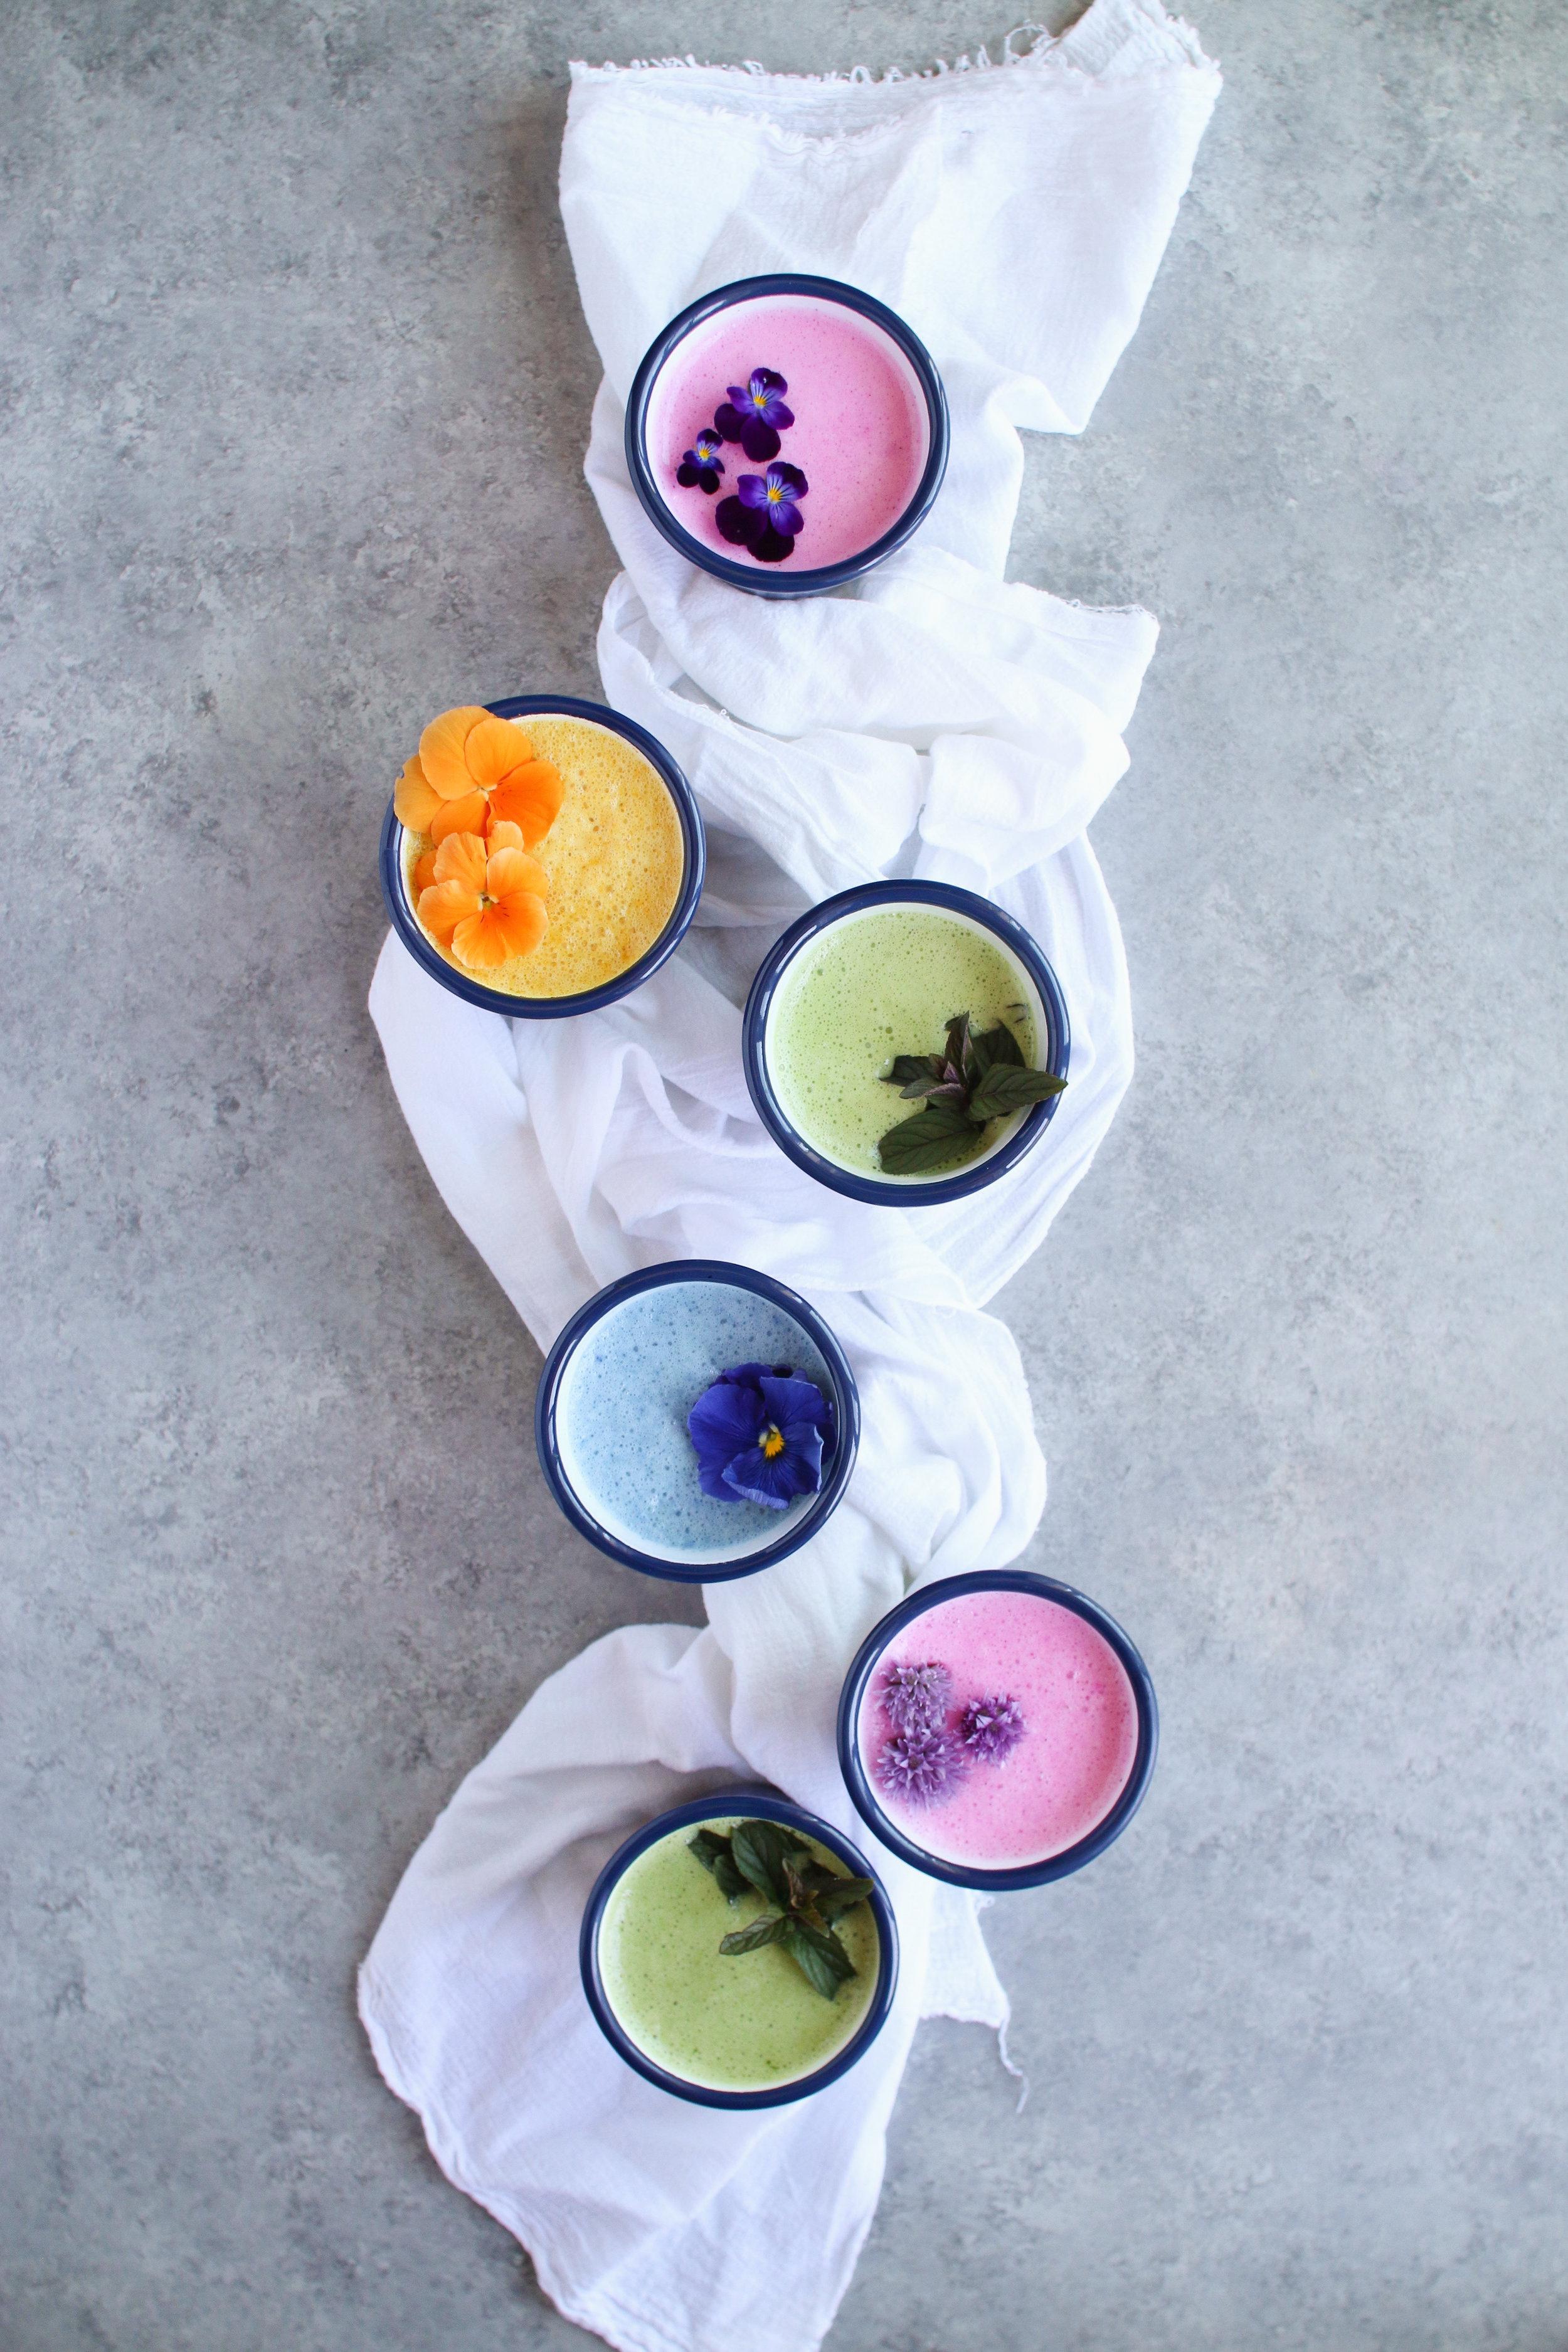 falcon enamelware Rainbow adaptogen iced lattes -